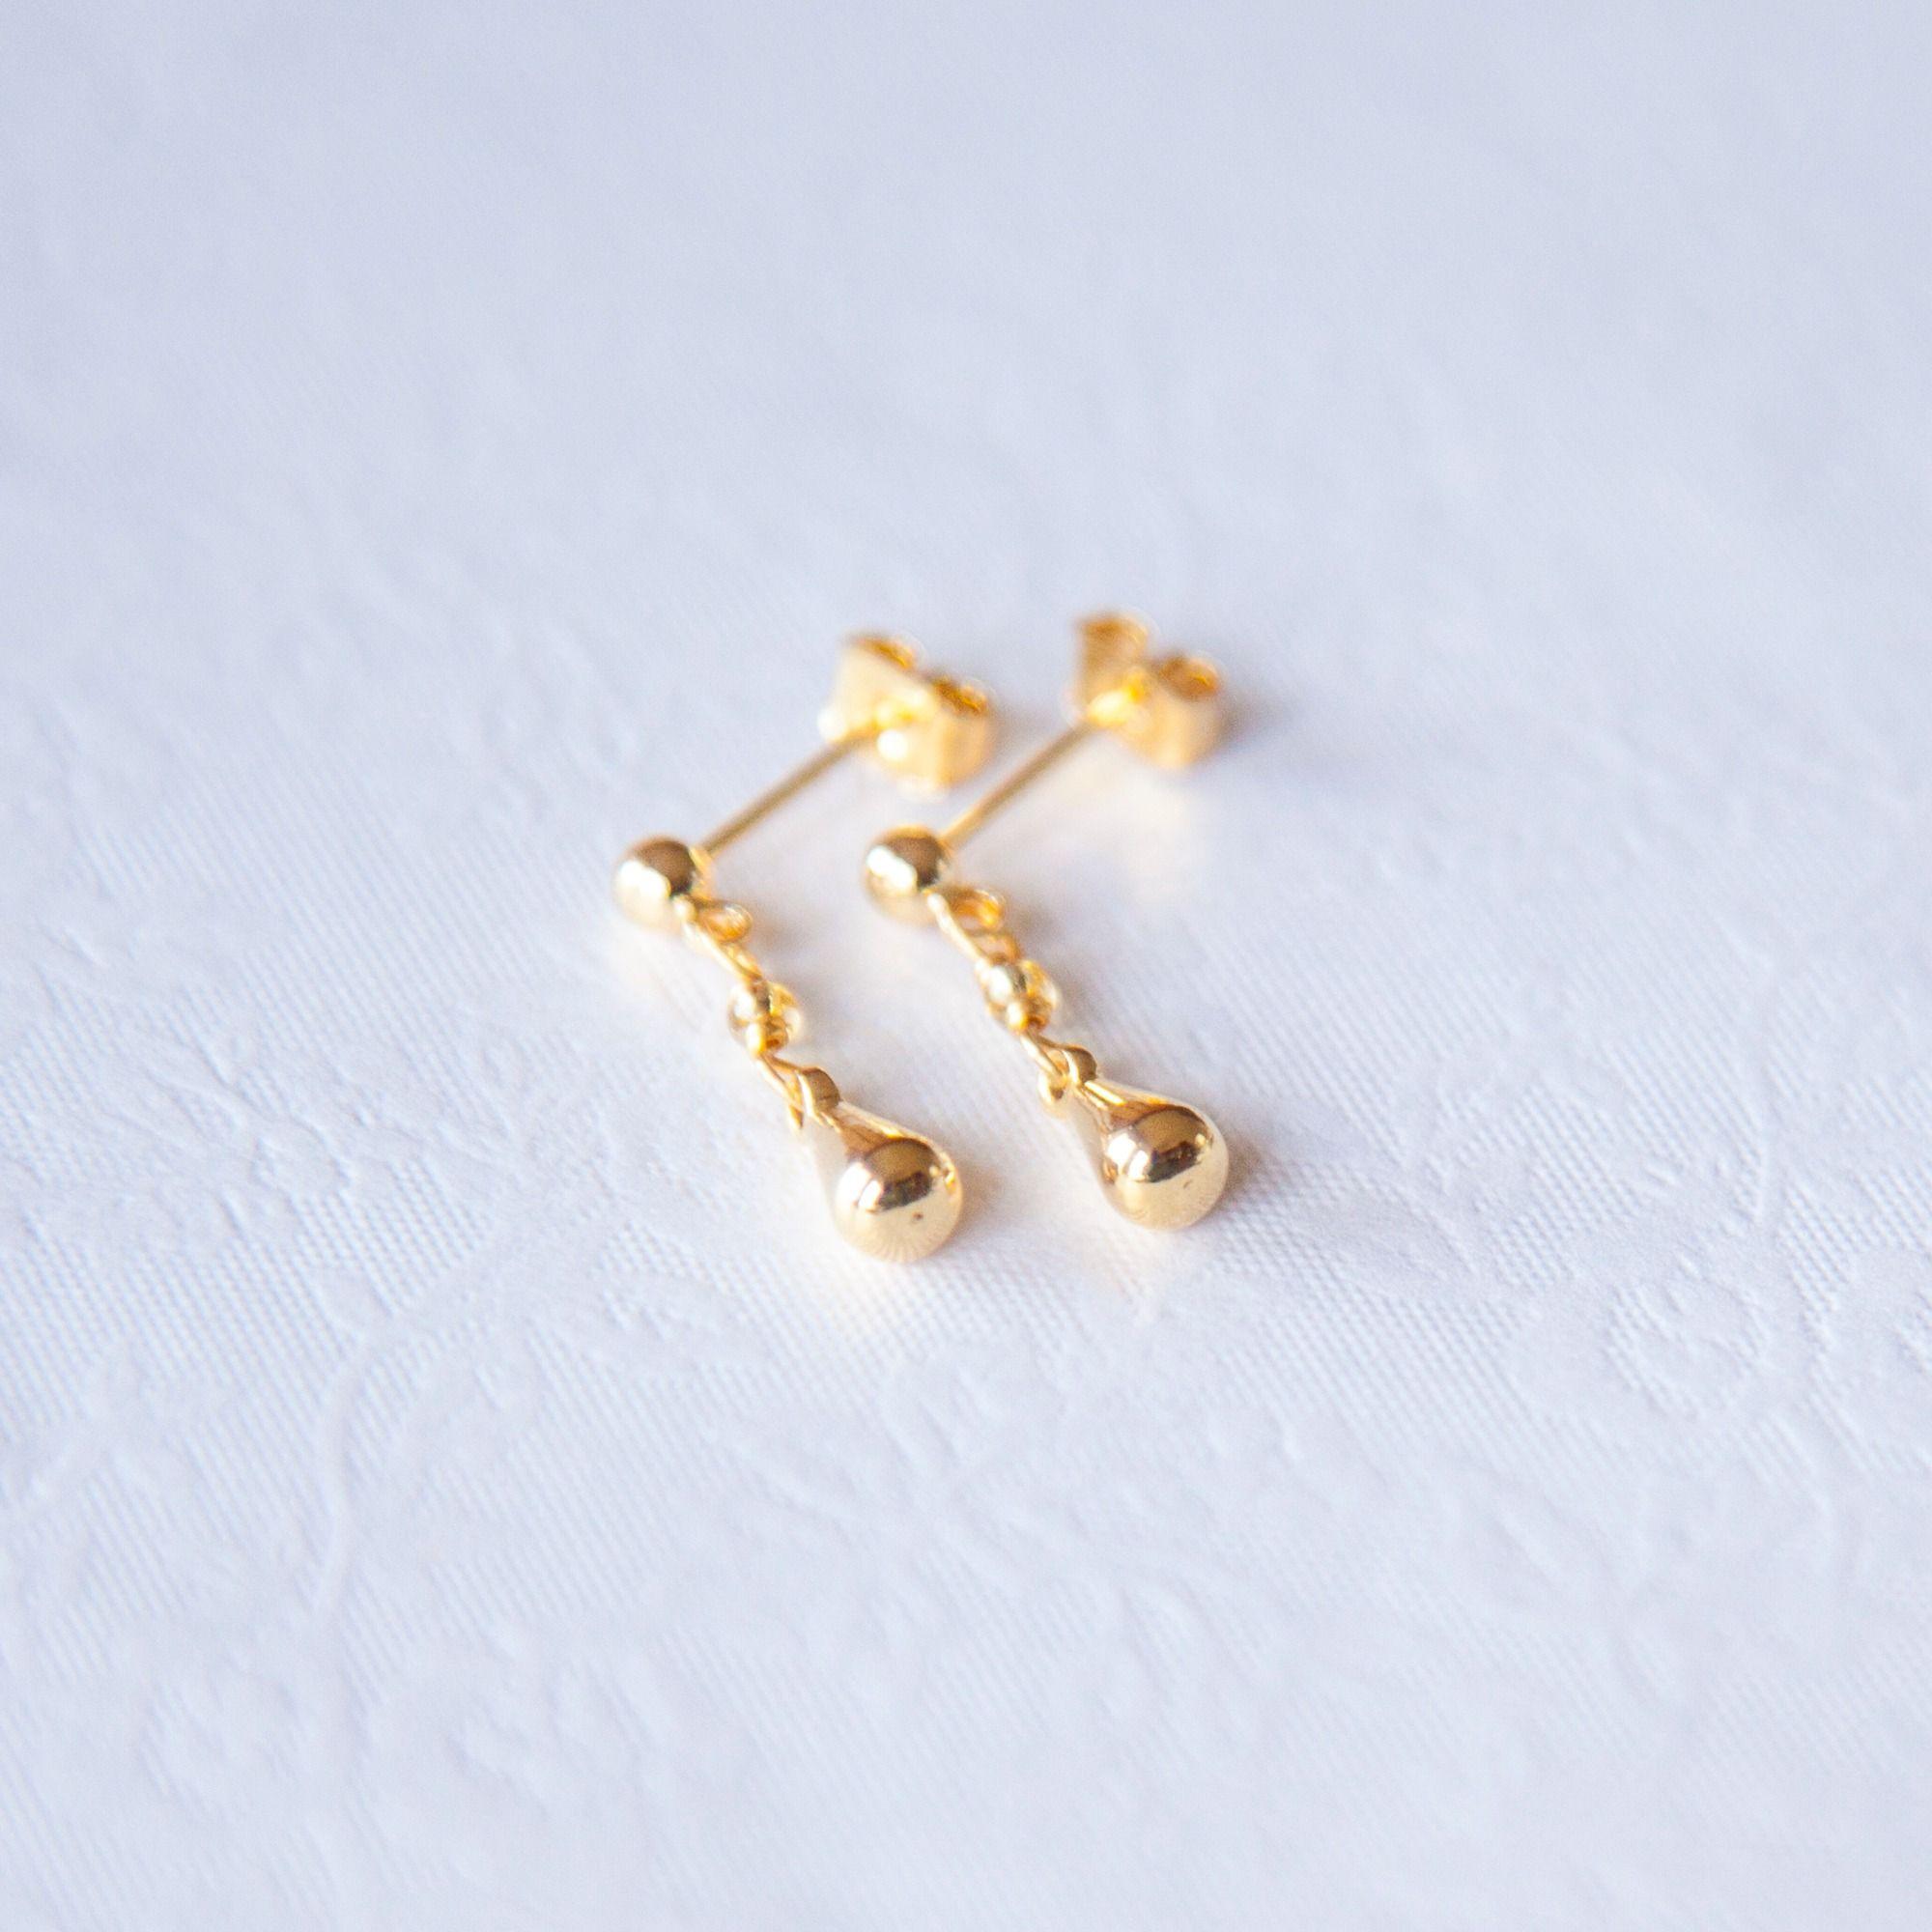 Tiny Tear Drop Earrings Gold Filled Small Minimalist Studs